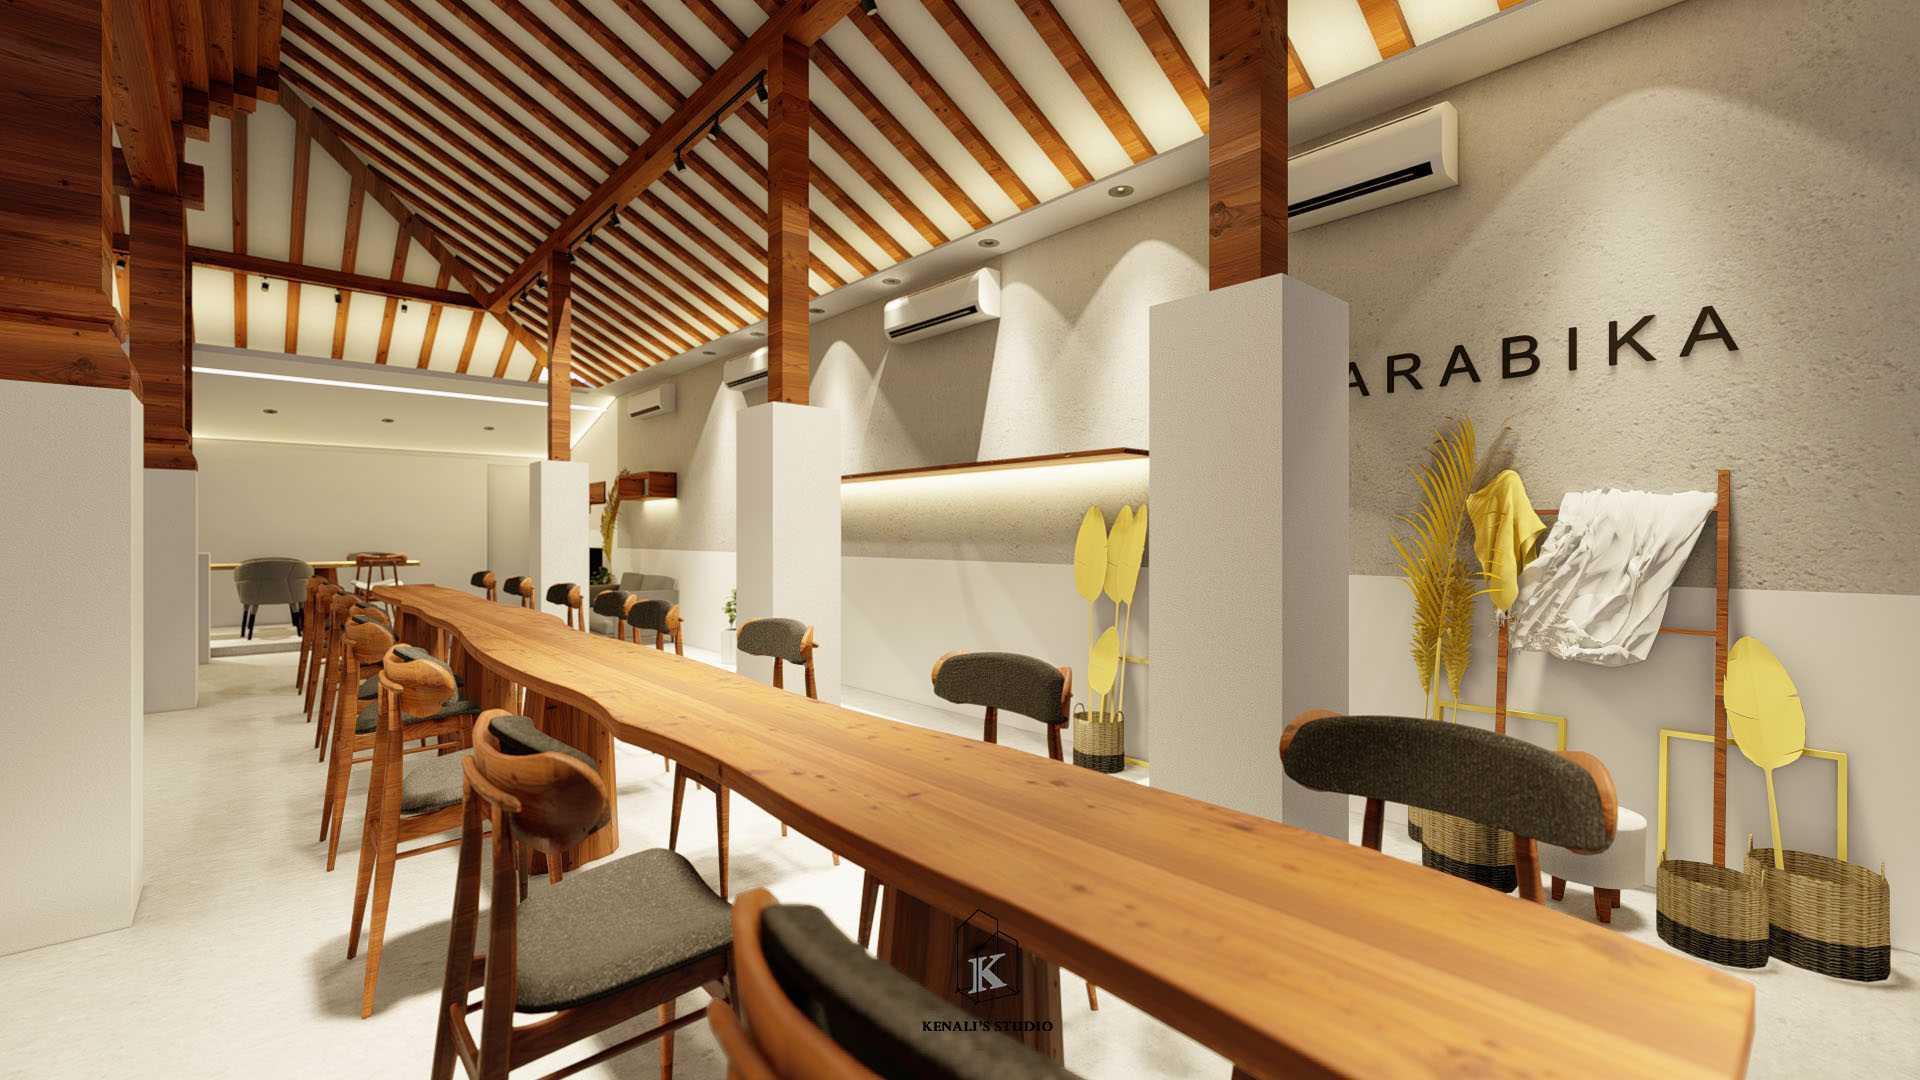 Kenali's Studio Arabika Cafe Semarang, Kota Semarang, Jawa Tengah, Indonesia Semarang, Kota Semarang, Jawa Tengah, Indonesia Kenalis-Studio-Arabika-Cafe Scandinavian  93655